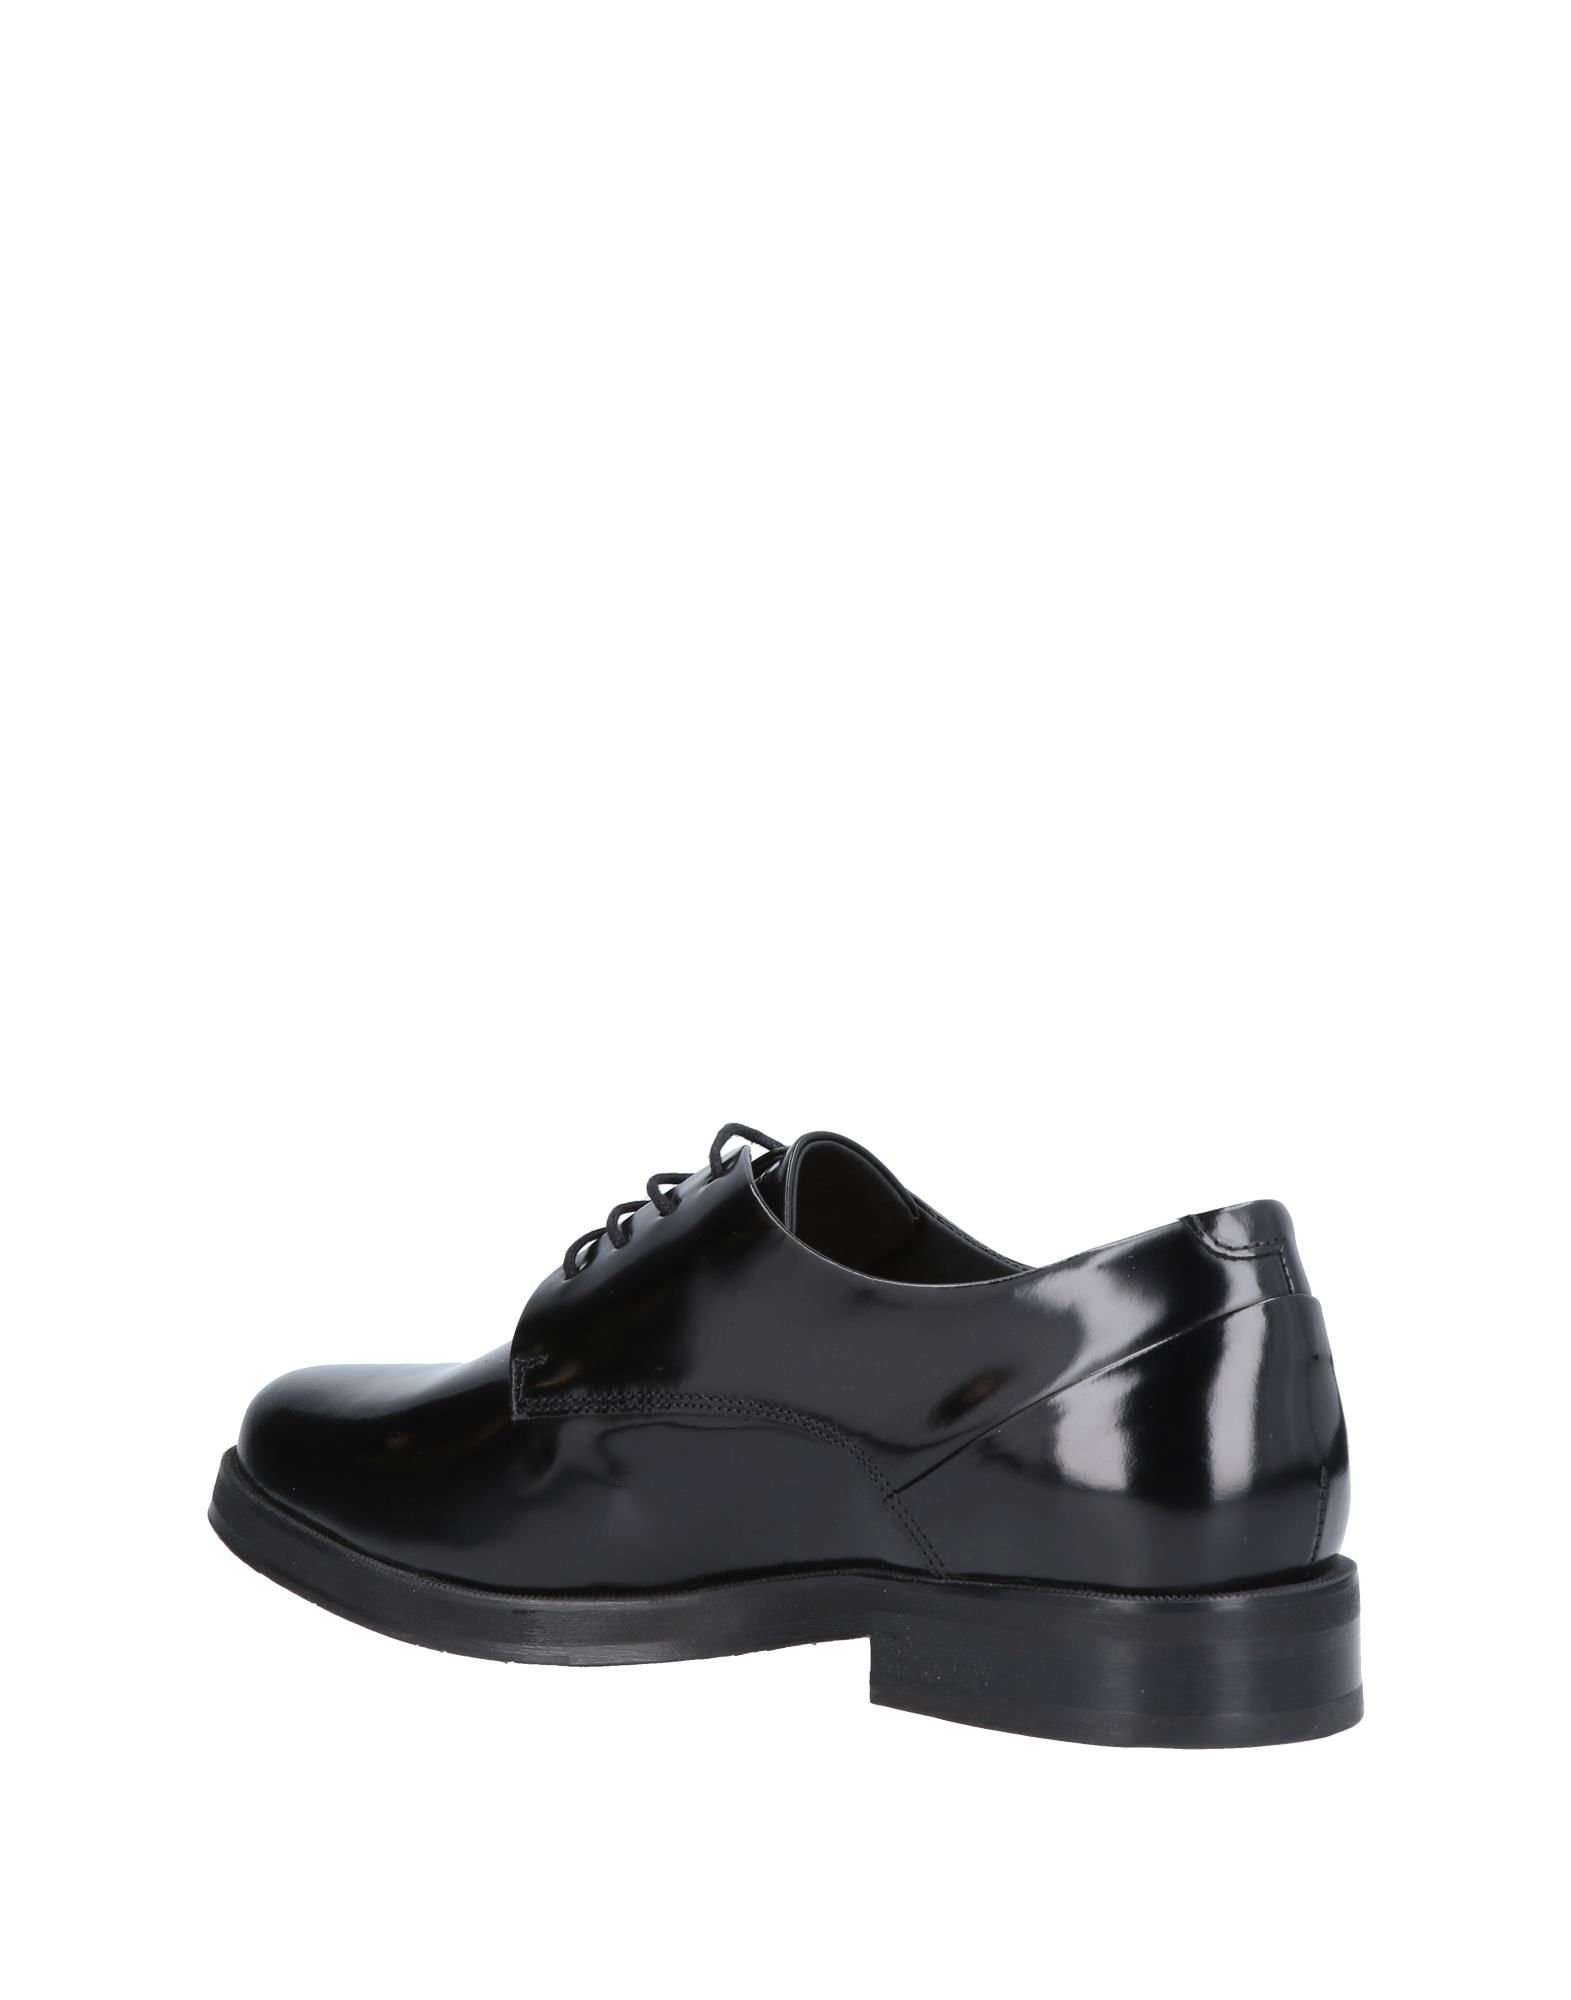 CHAUSSURES - Chaussures à lacetsRupert Sanderson FIYjq